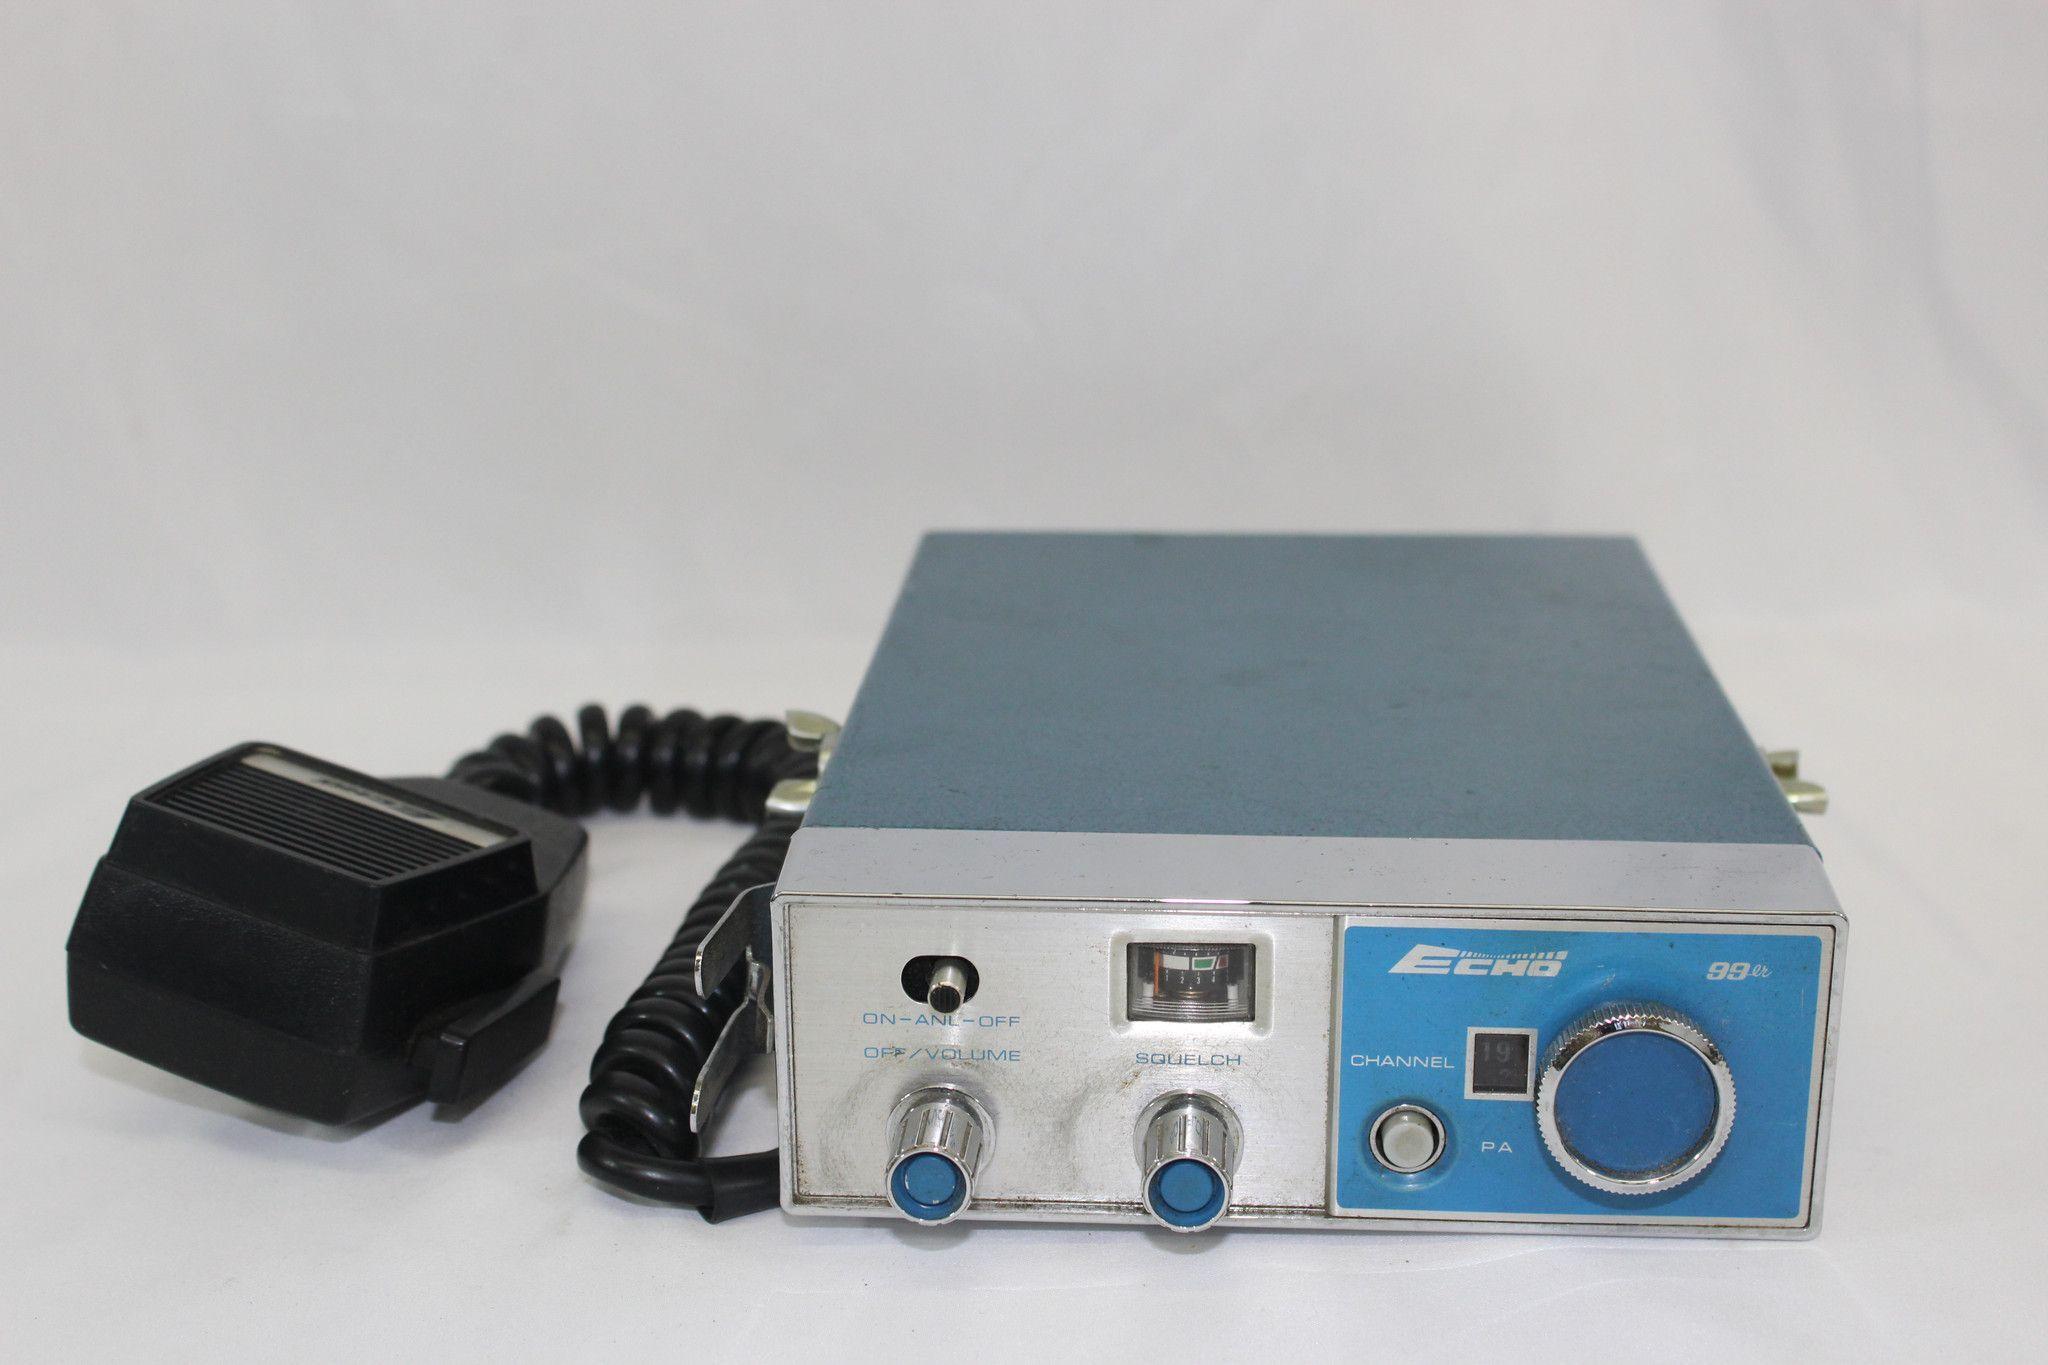 echo 99er cb radio 23 channel citizens band transceiver [ 2048 x 1365 Pixel ]